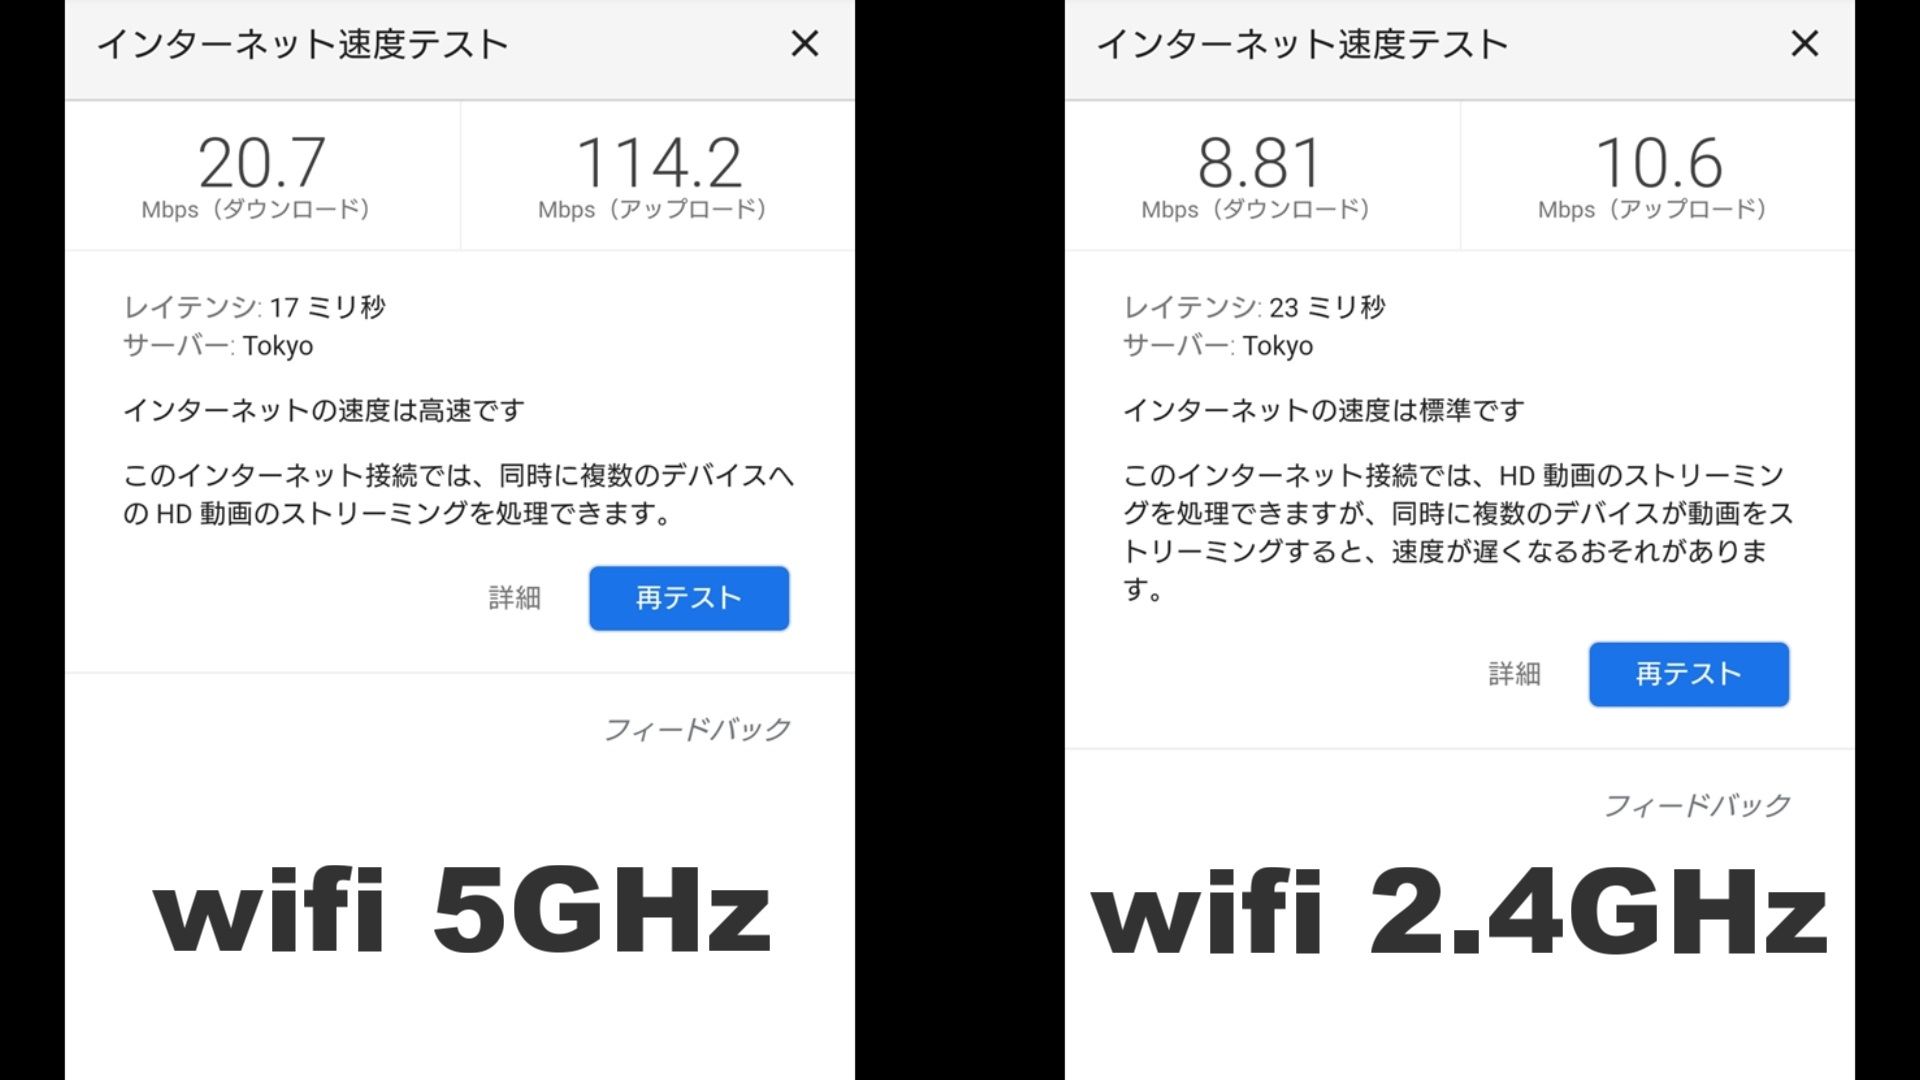 5GHzで20.7Mbps、2.4GHzだと8.81Mbpsです。